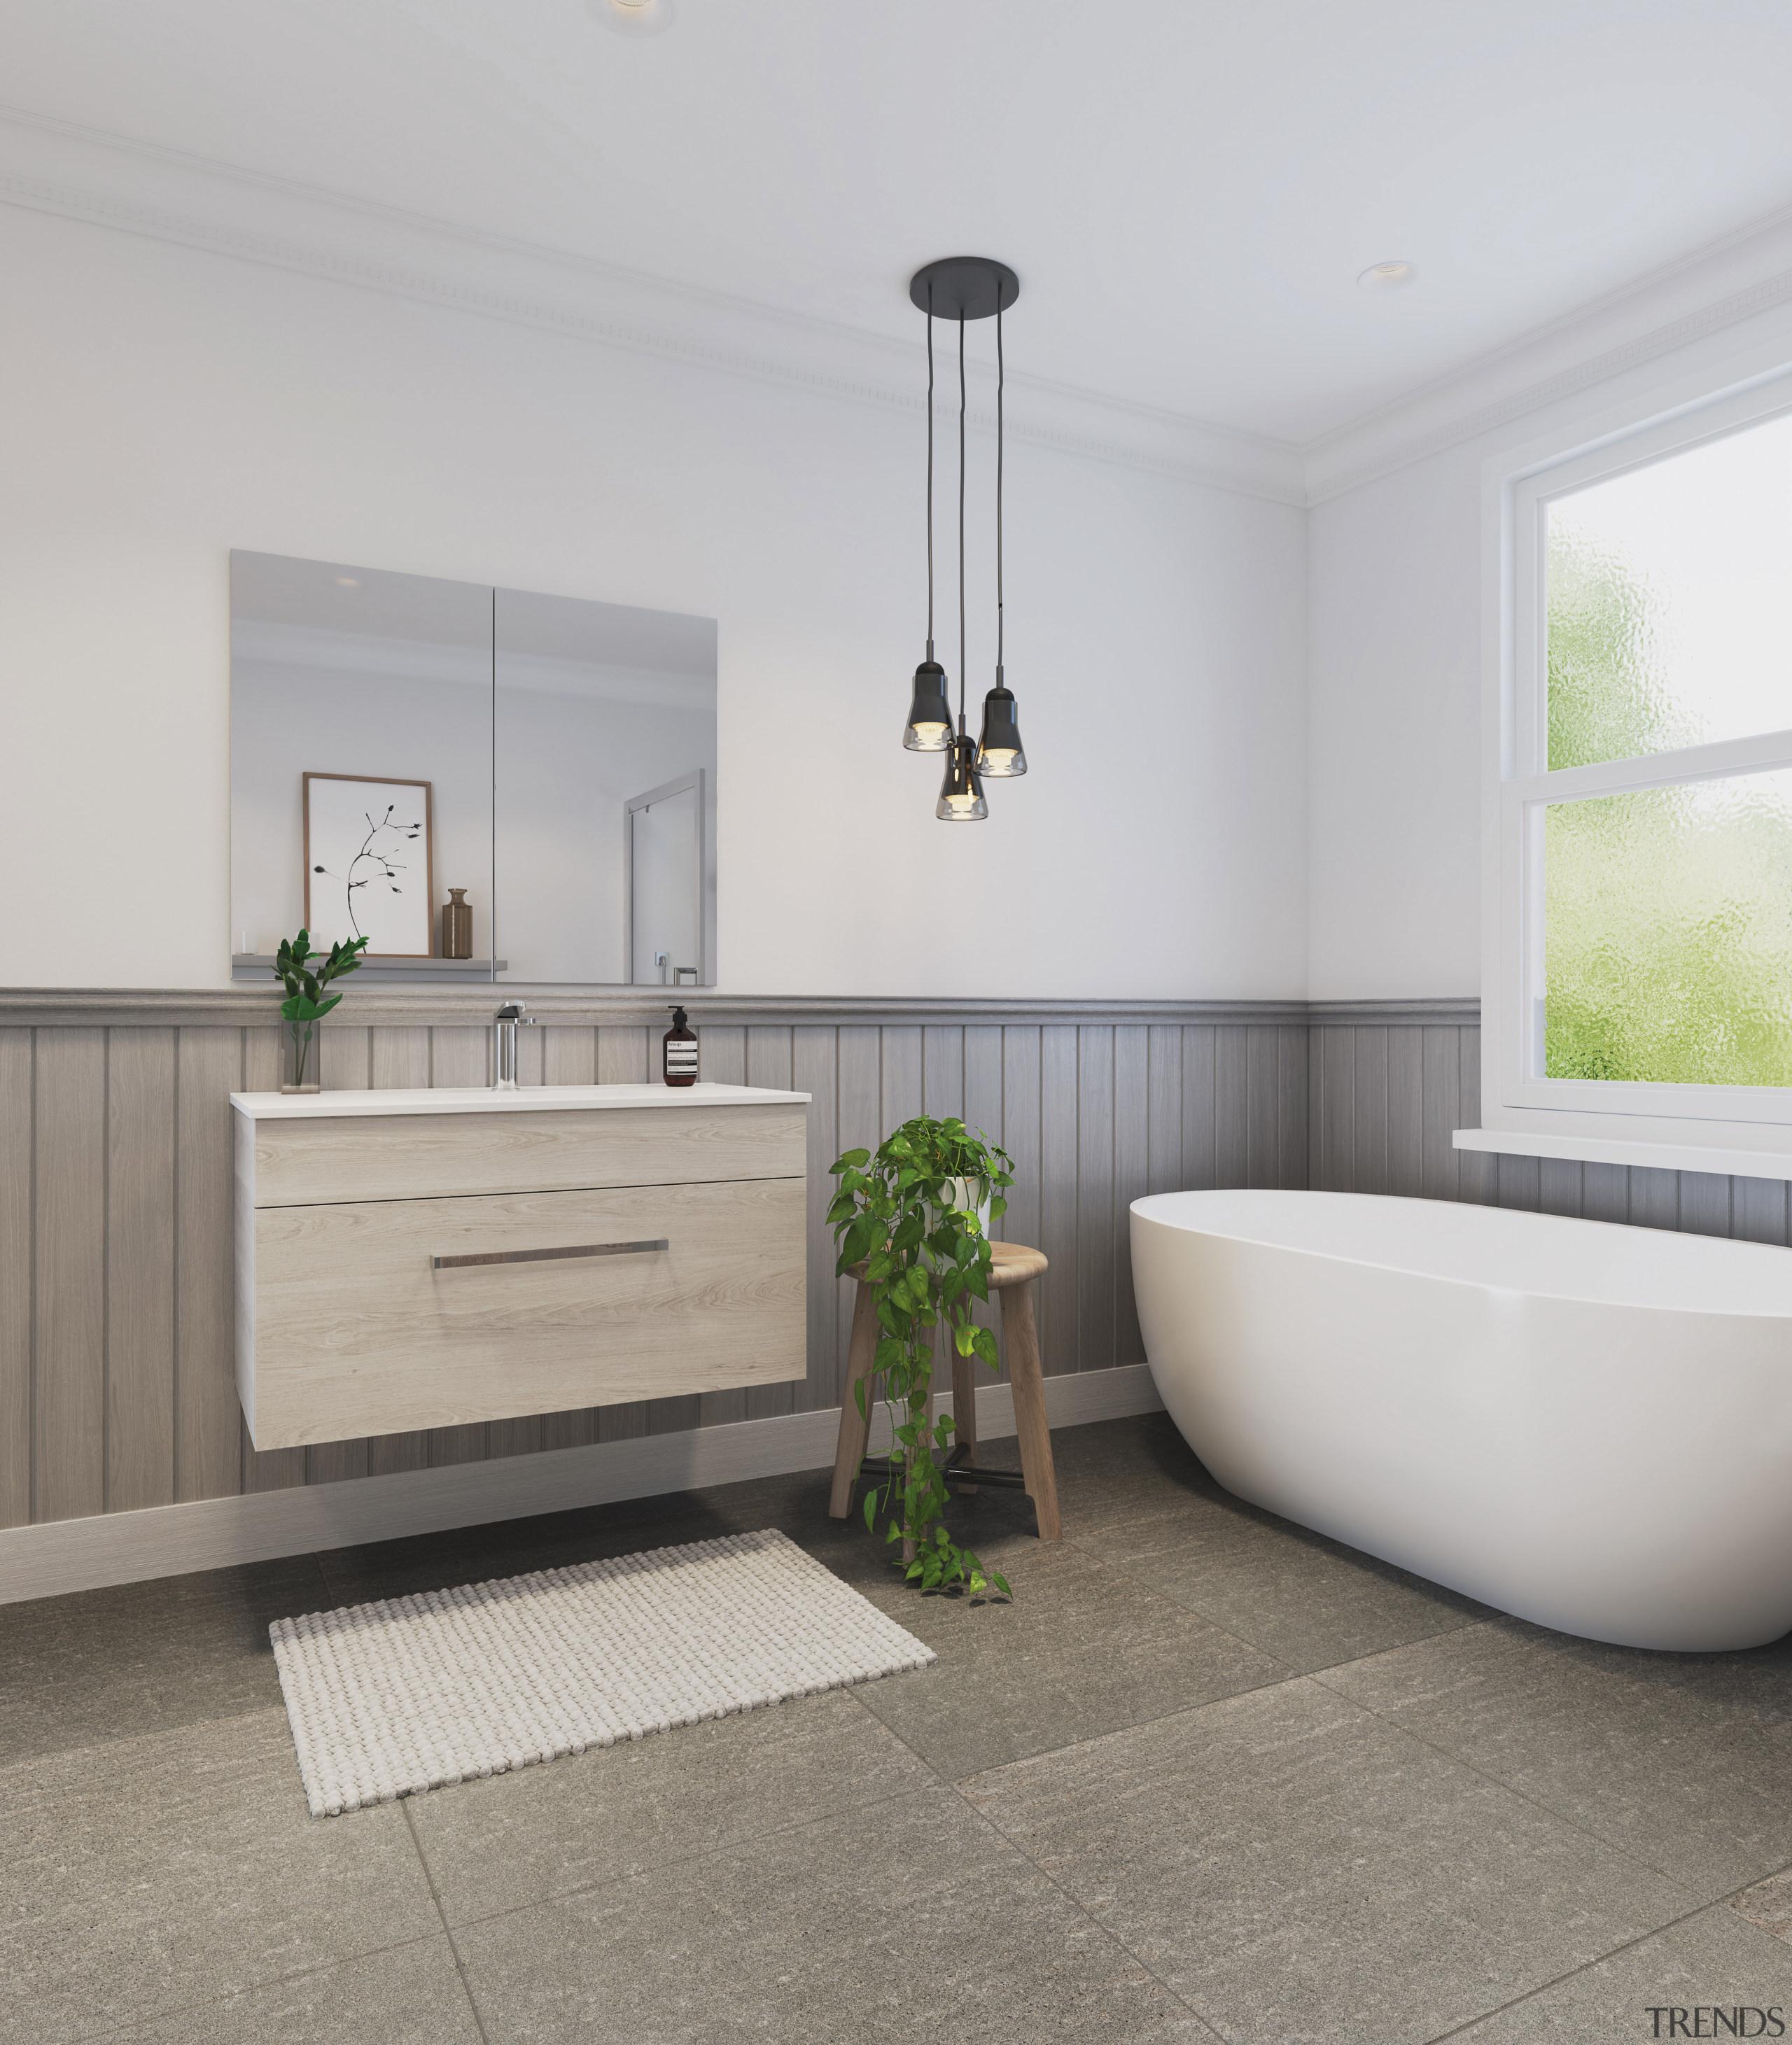 When it comes to storage, more is always bathroom, bathroom accessory, floor, flooring, interior design, plumbing fixture, product, room, sink, tap, tile, gray